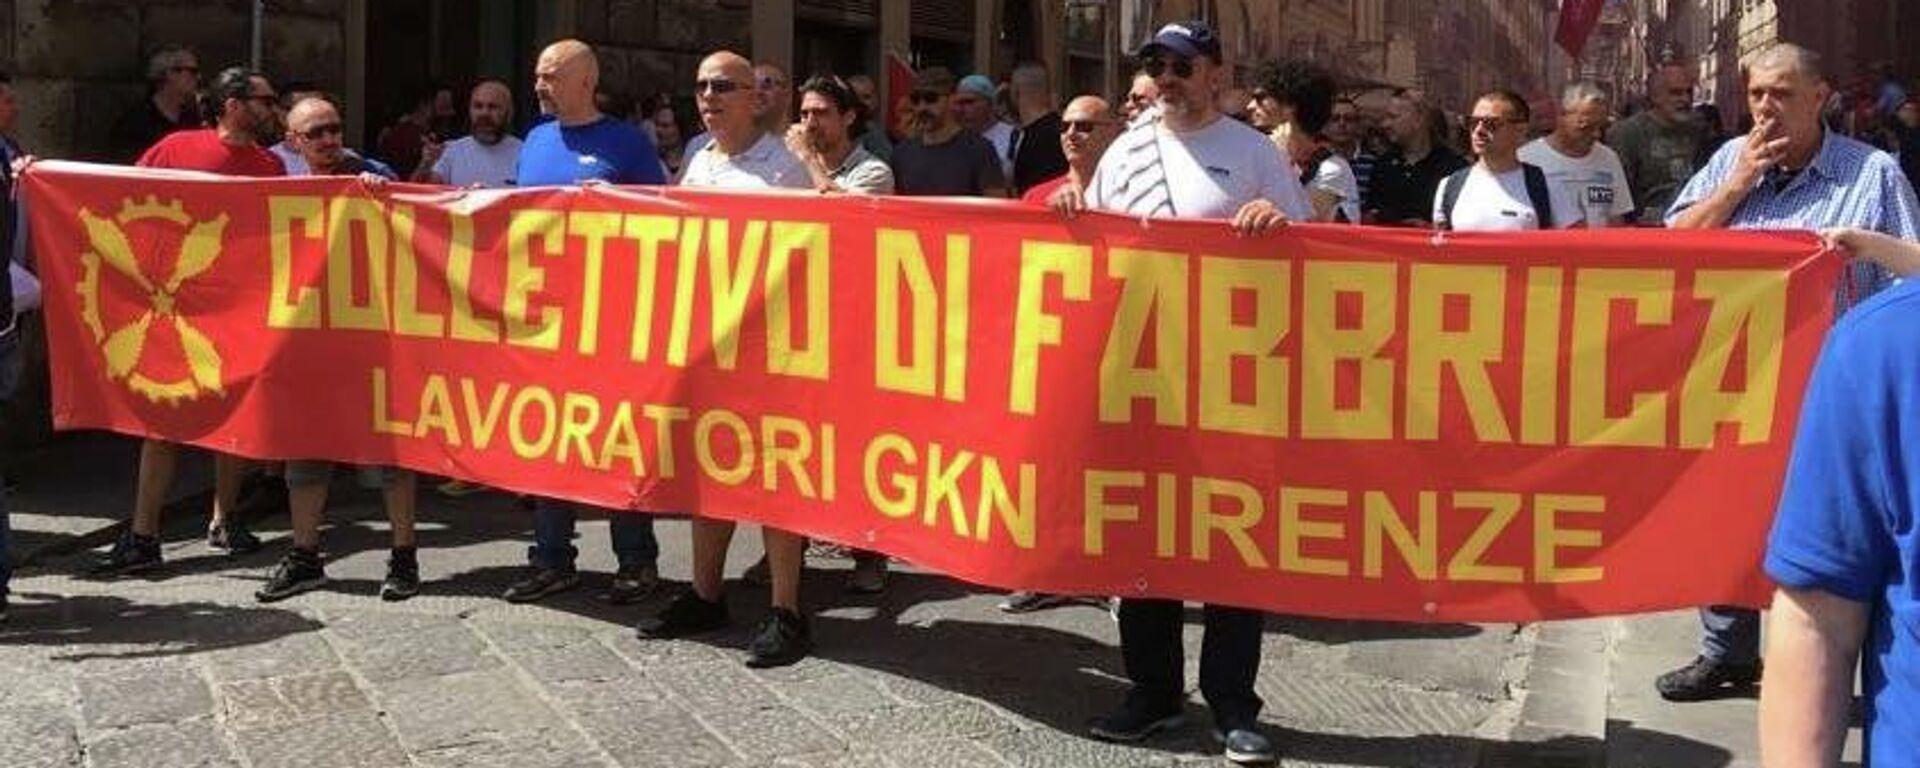 Lavoratori Gkn Firenze - Sputnik Italia, 1920, 14.07.2021